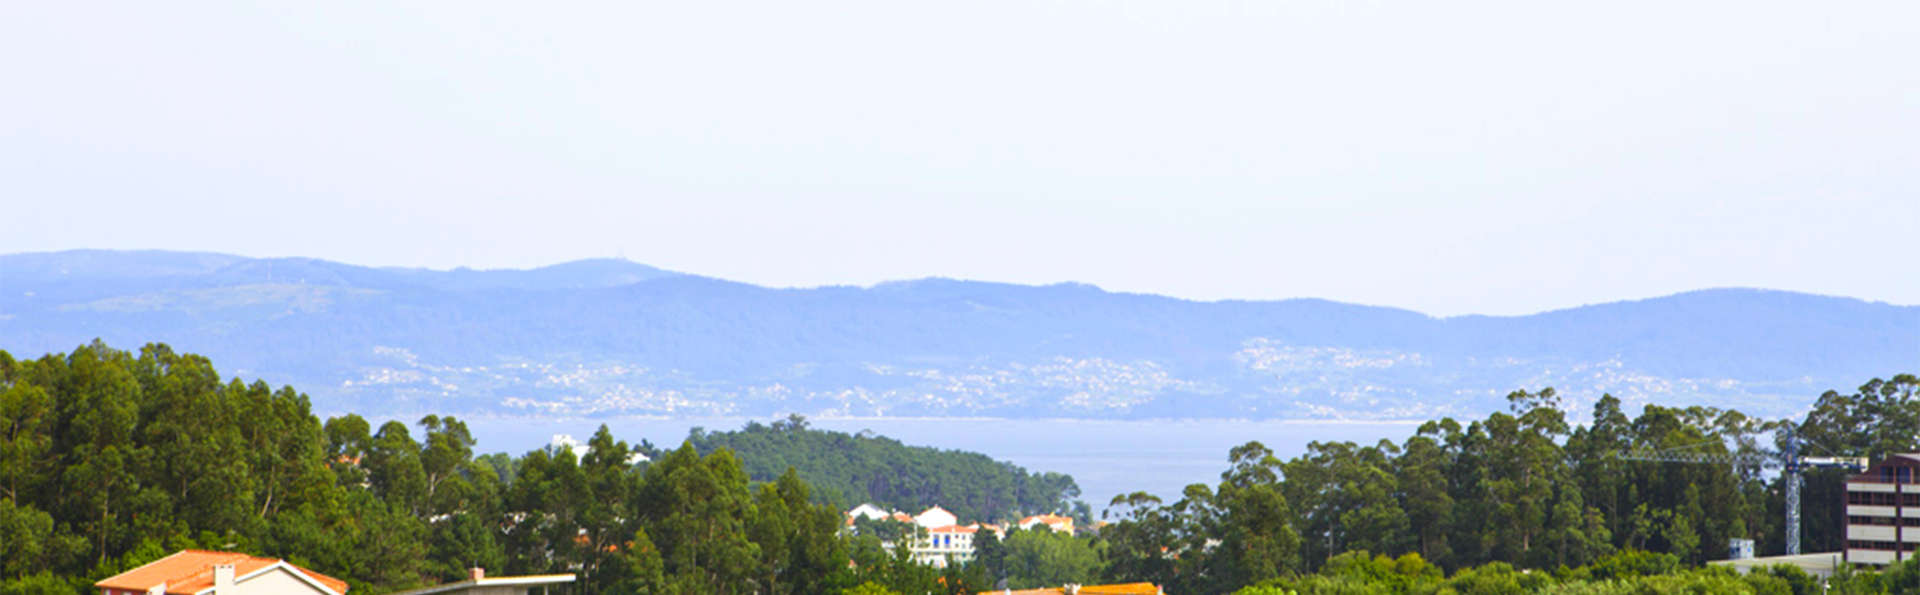 Hotel Peregrina - EDIT_destination2.jpg